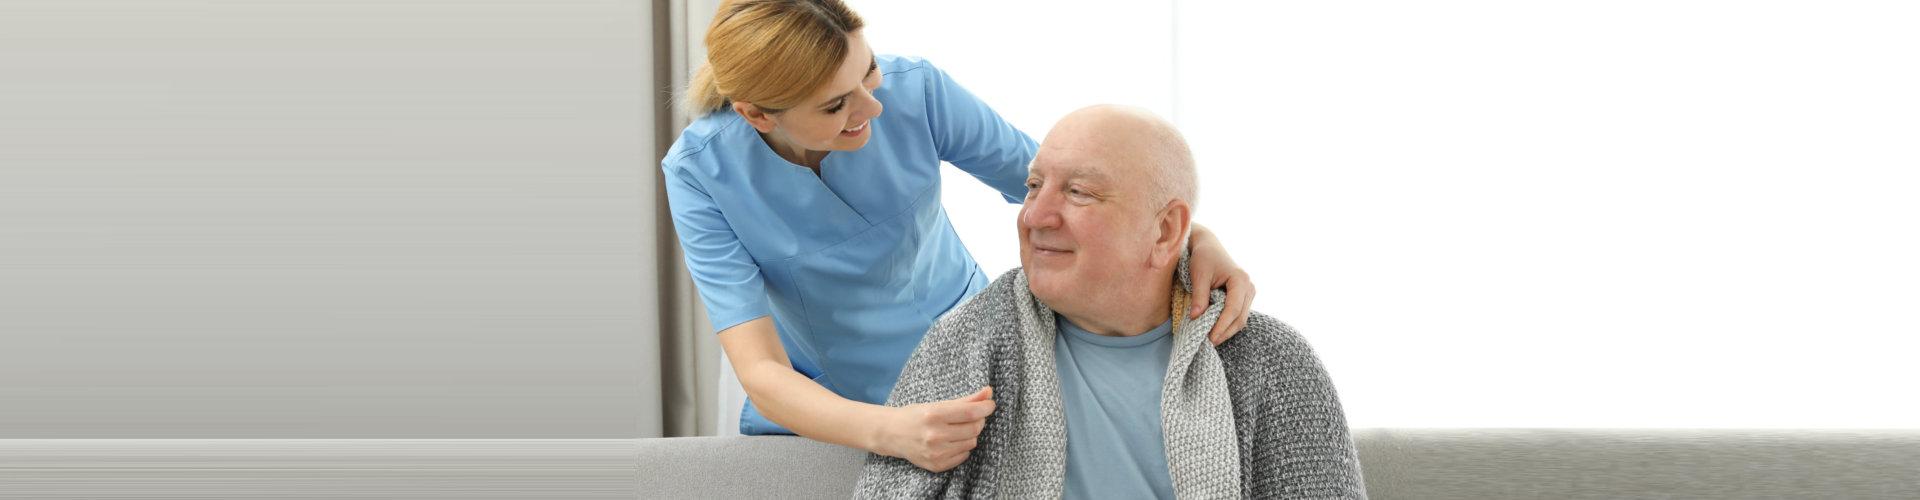 caregiver keeping her patient warm